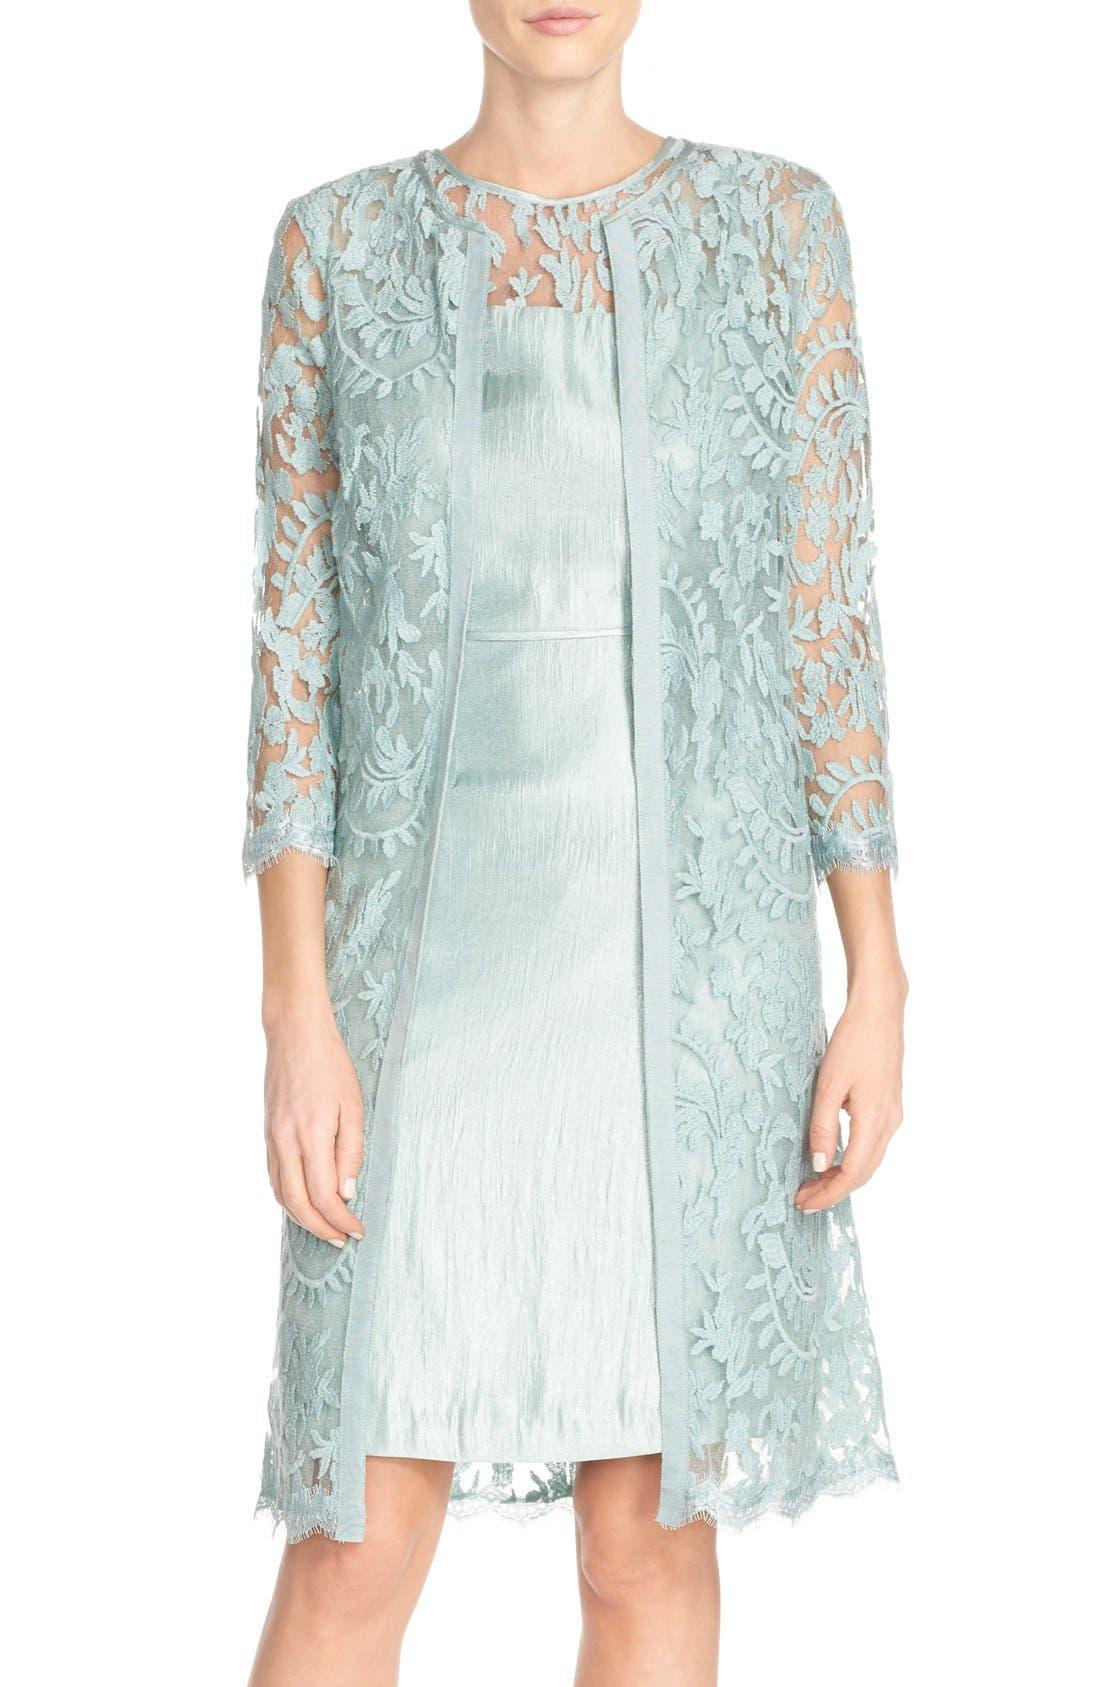 Main Image - Adrianna PapellEmbroidered Lace Illusion Yoke Sheath Dress &Topper (Regular & Petite)